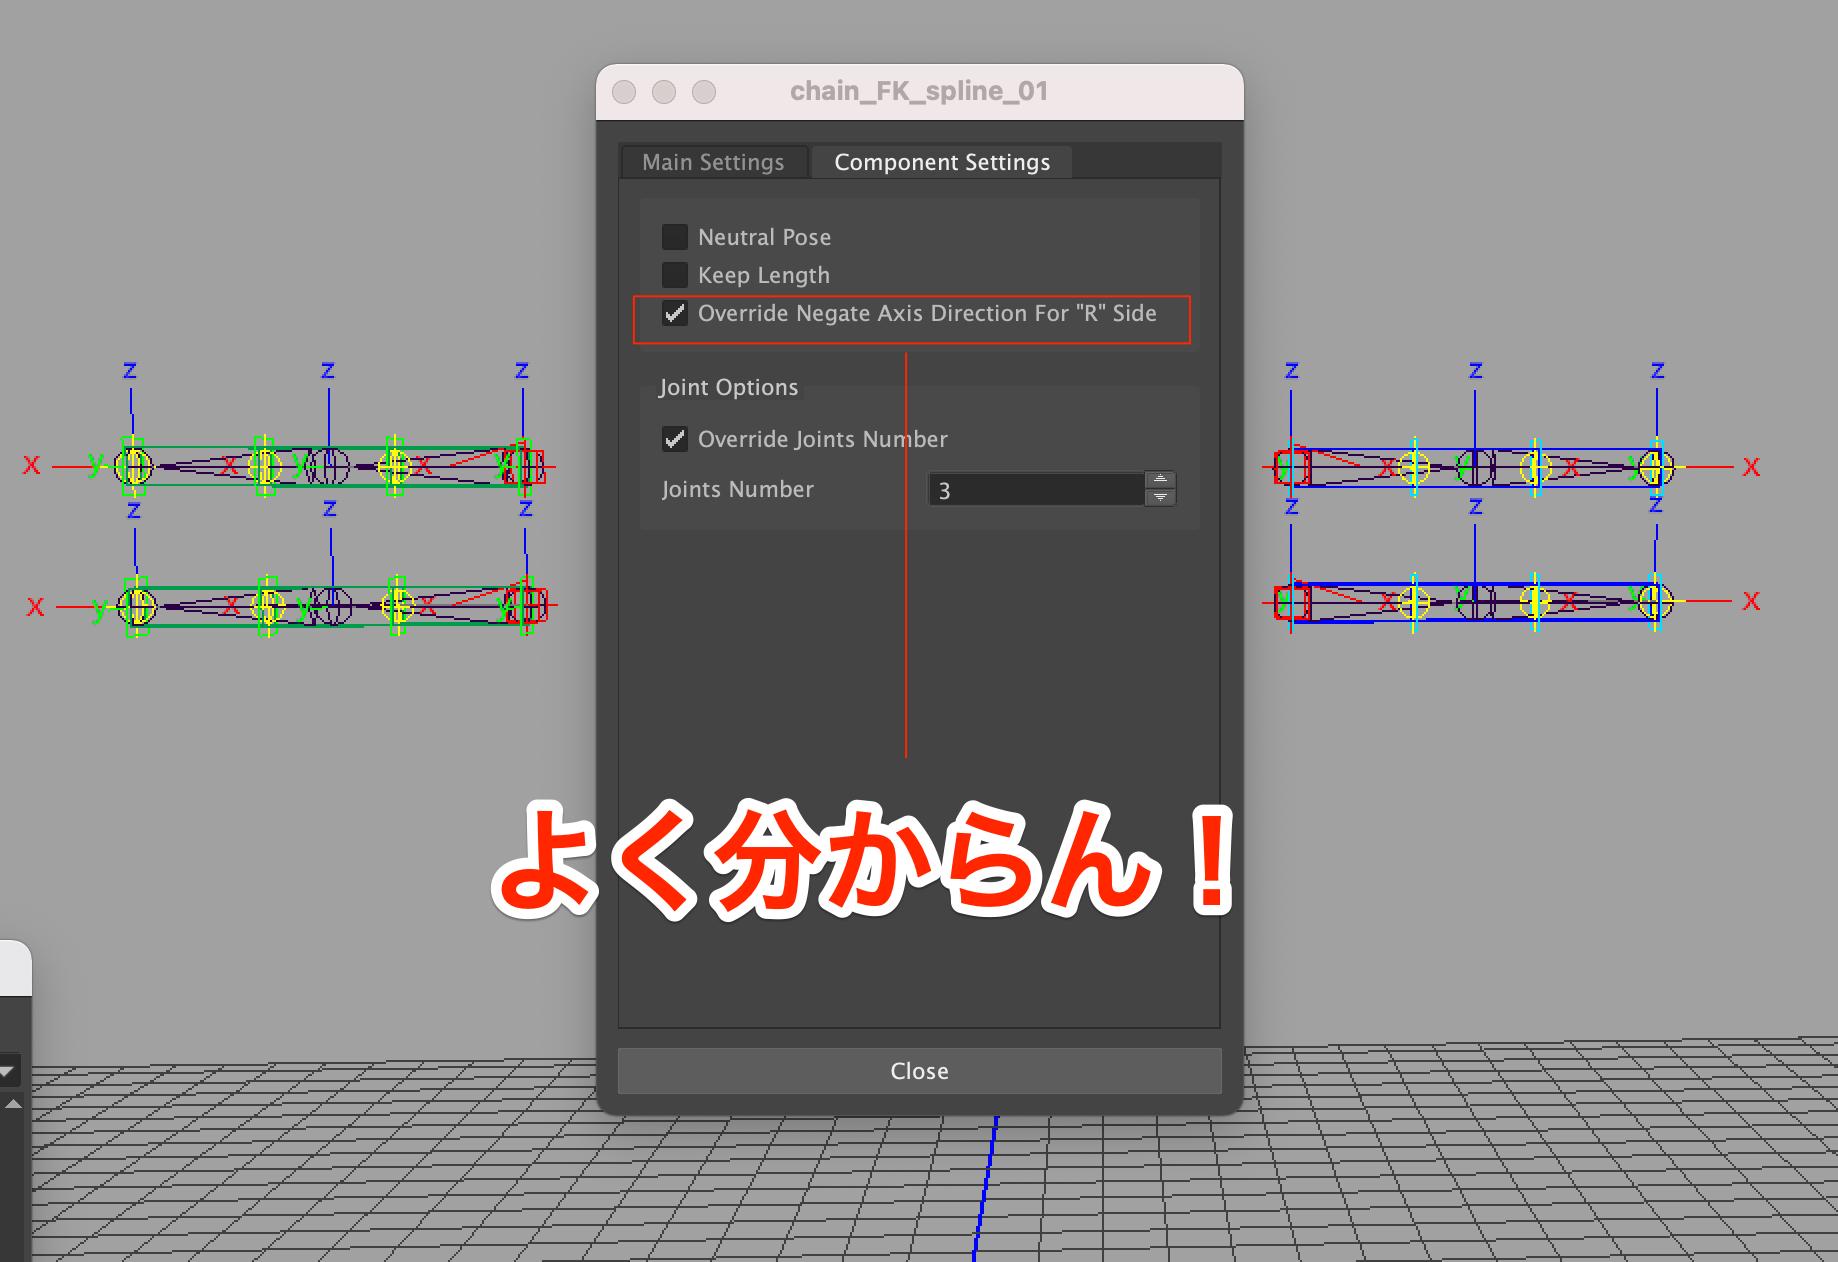 chain_FK_spline_01-004